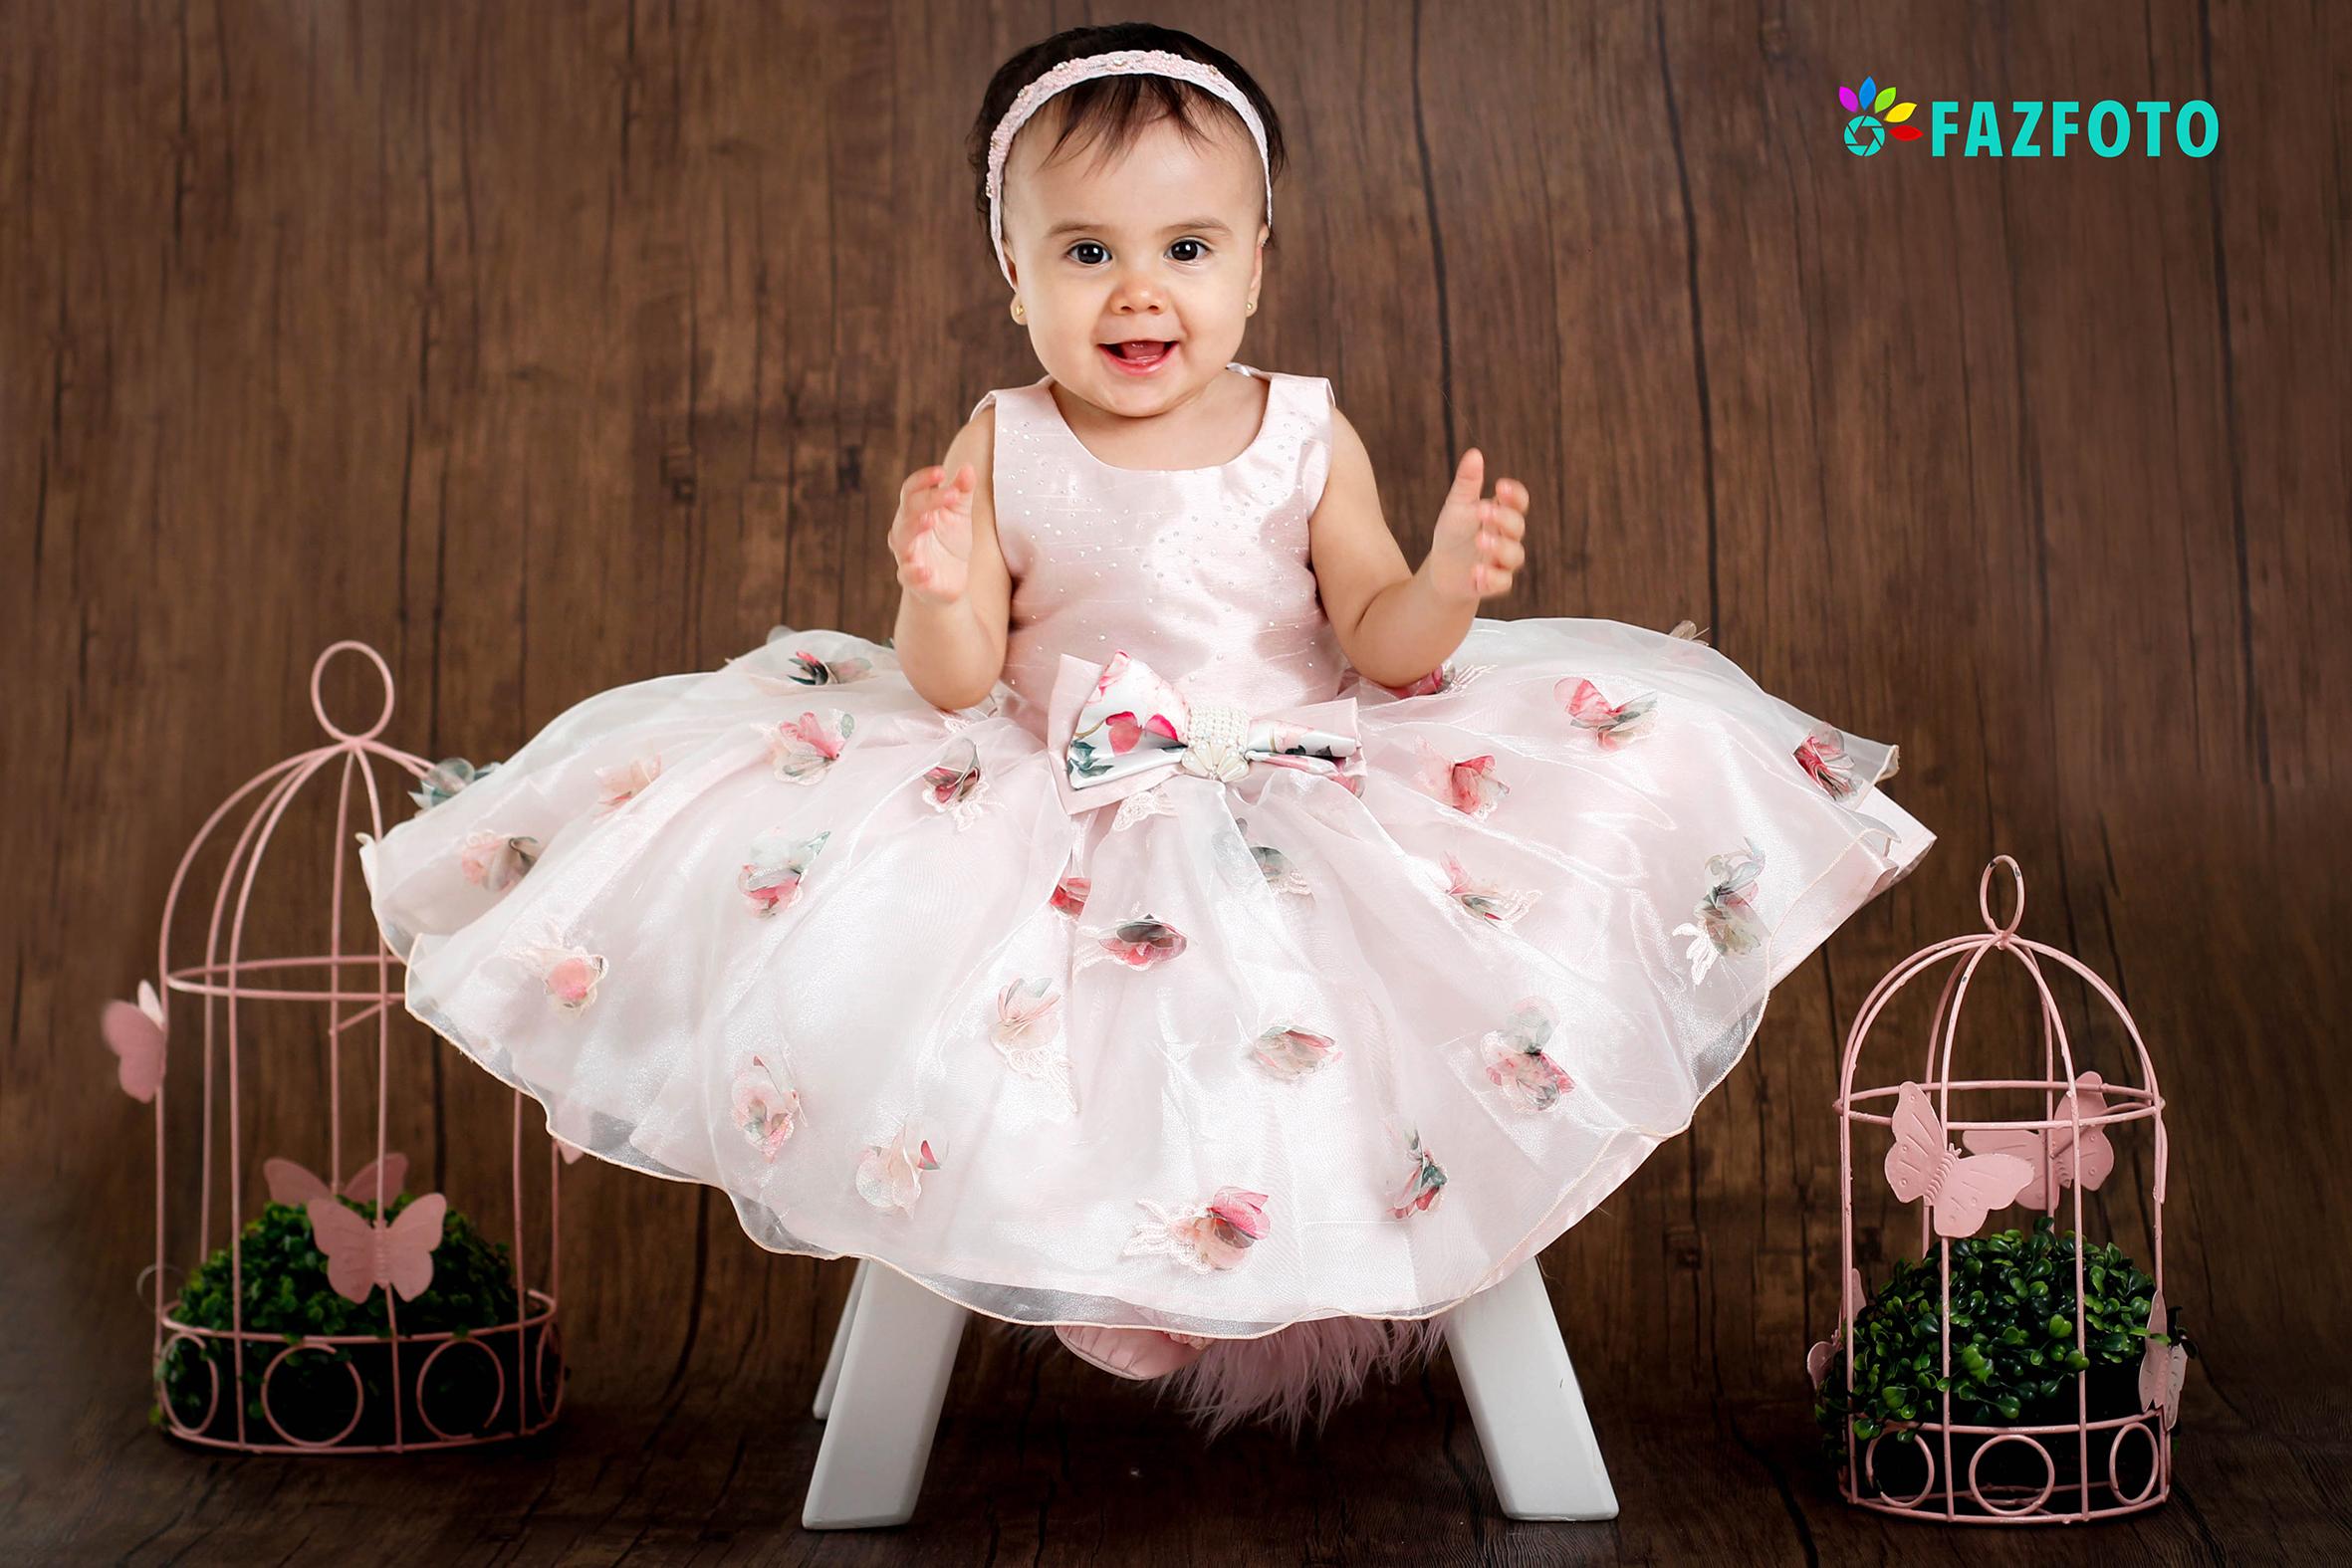 Ensaio Fotográfico InfantilBaby (1)